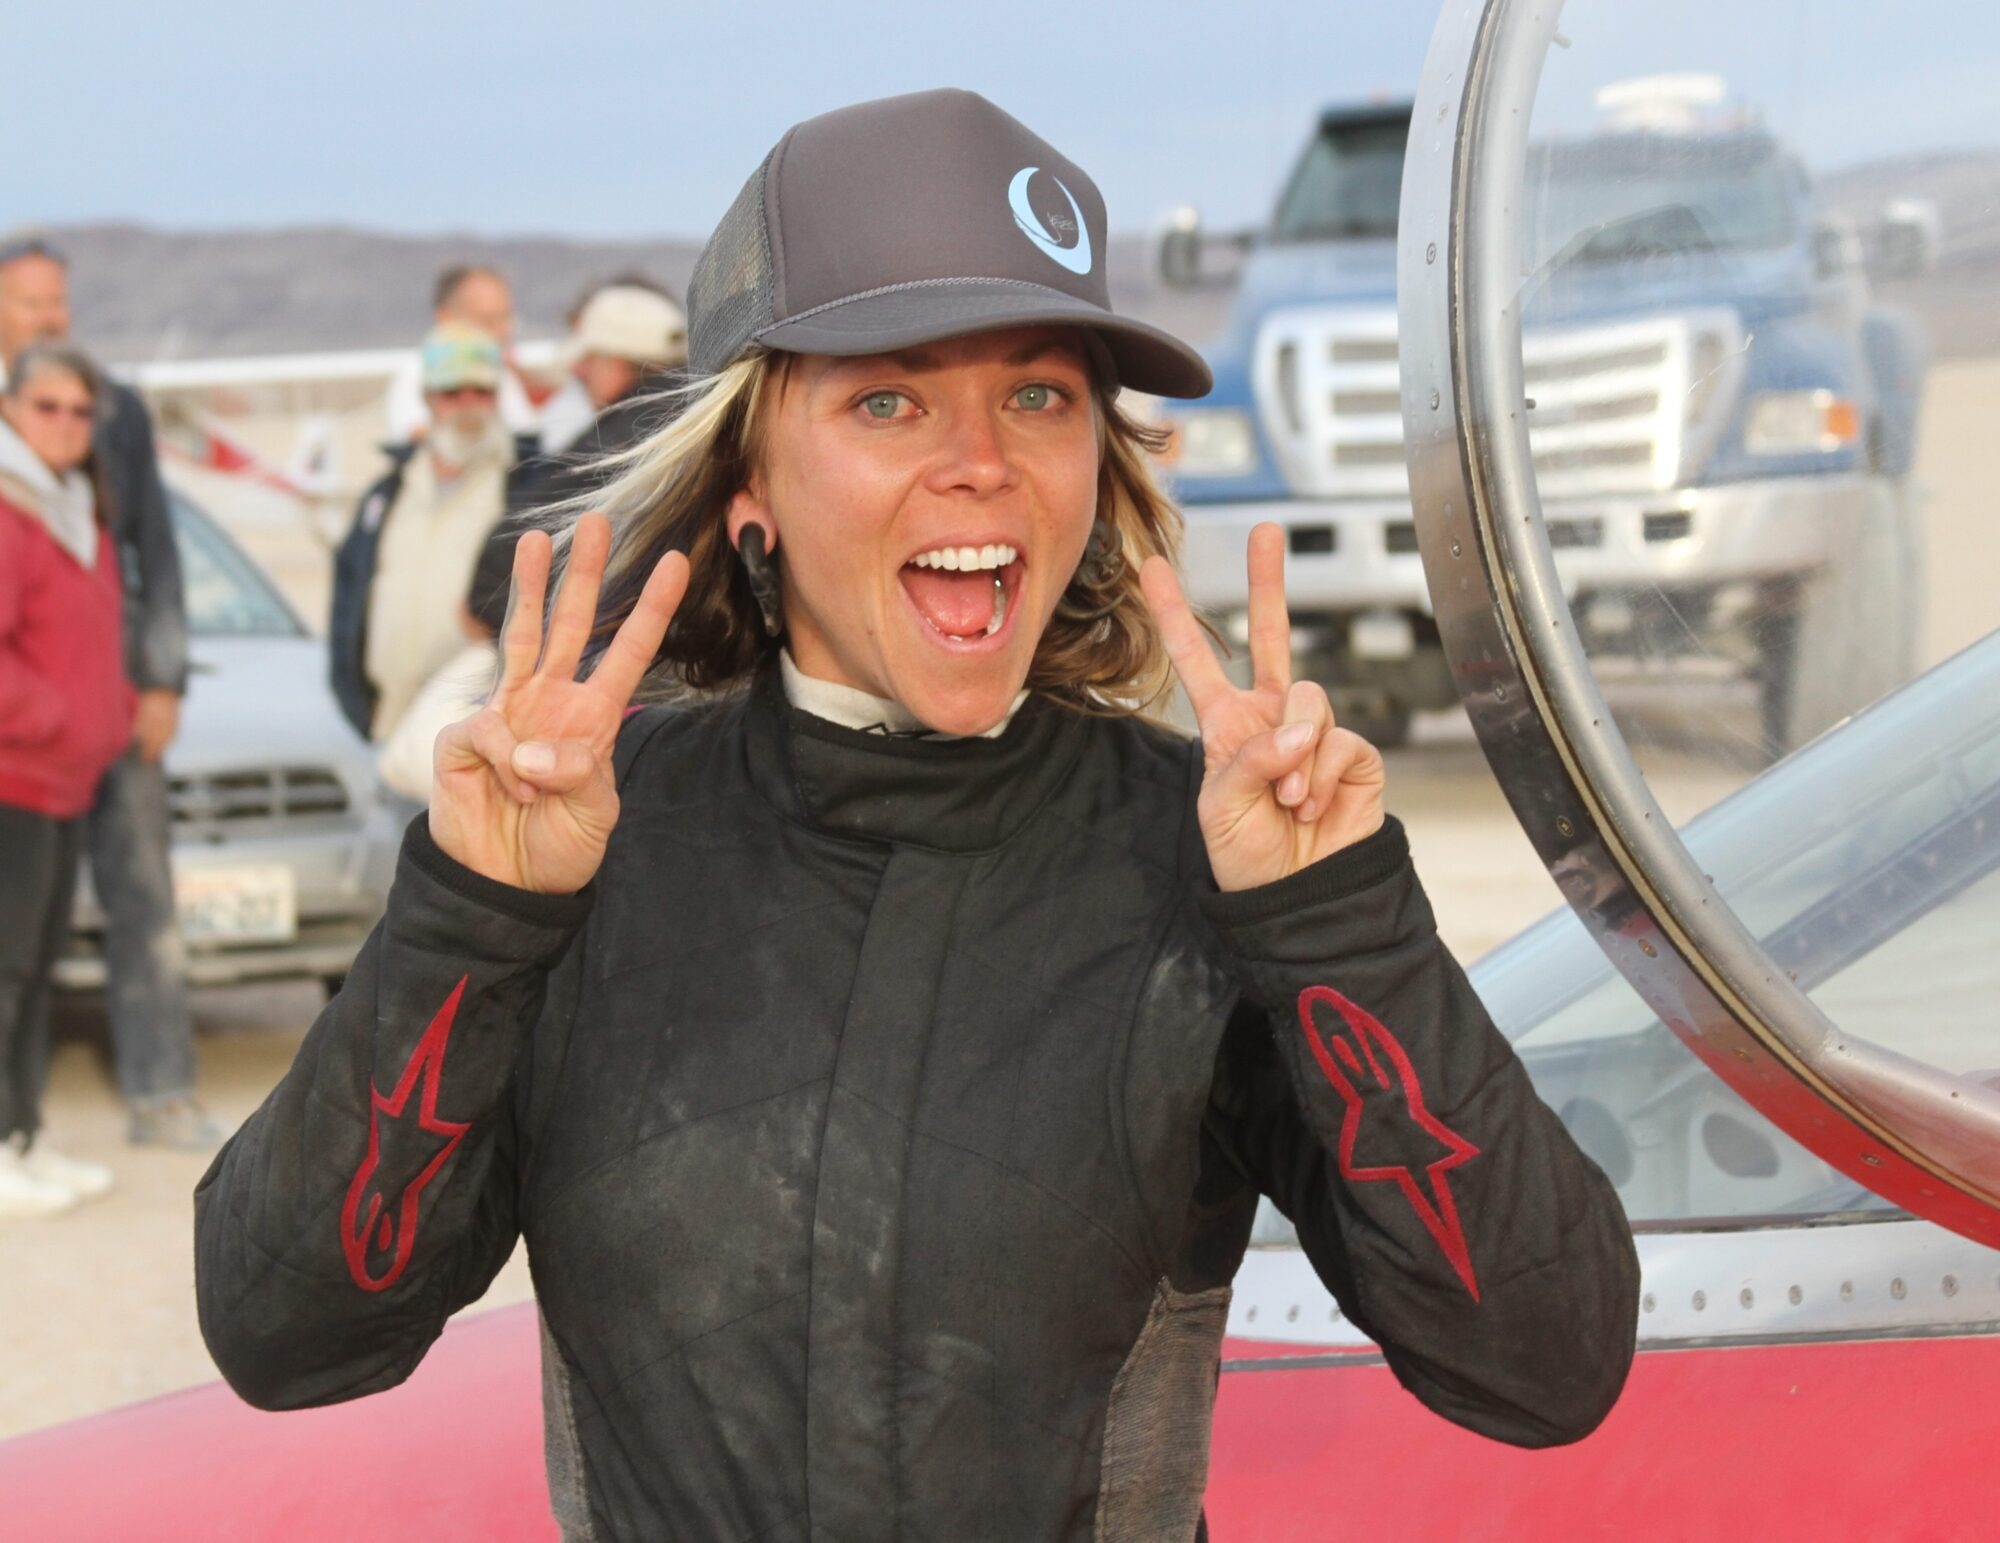 Morta la pilota Jessi Combs, ex presentatrice dei Mithbusters thumbnail